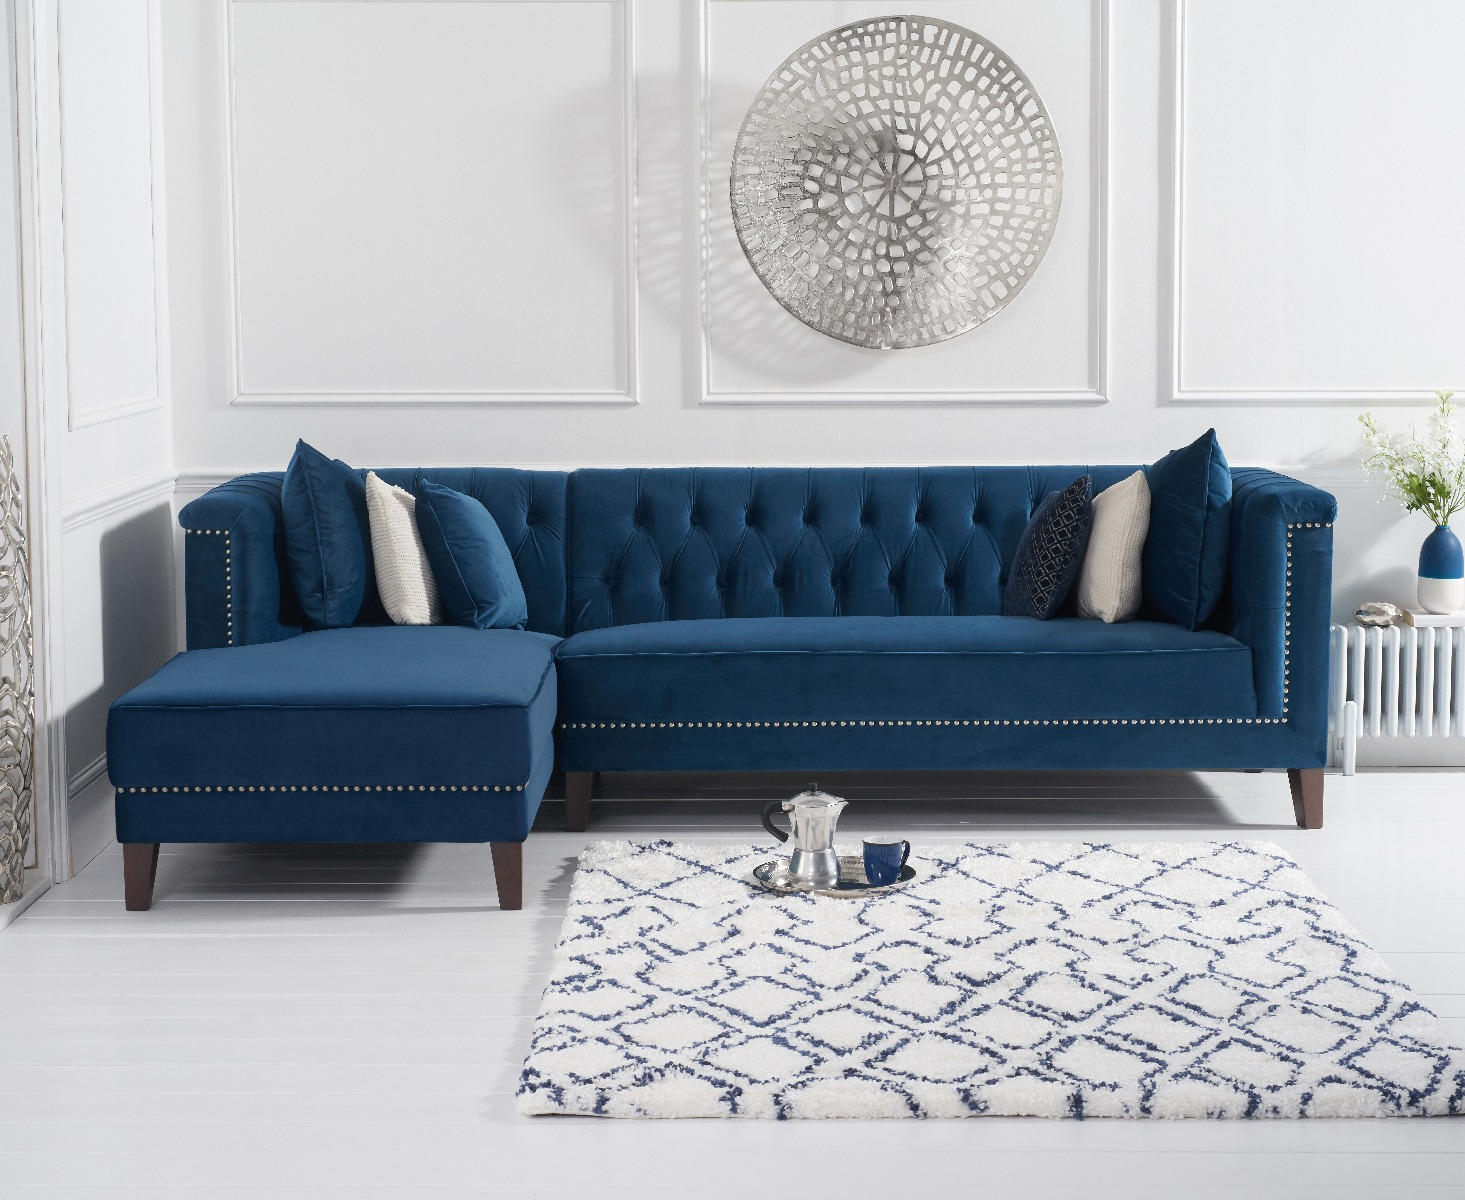 An image of Tammie Blue Velvet Left Facing Chaise Sofa